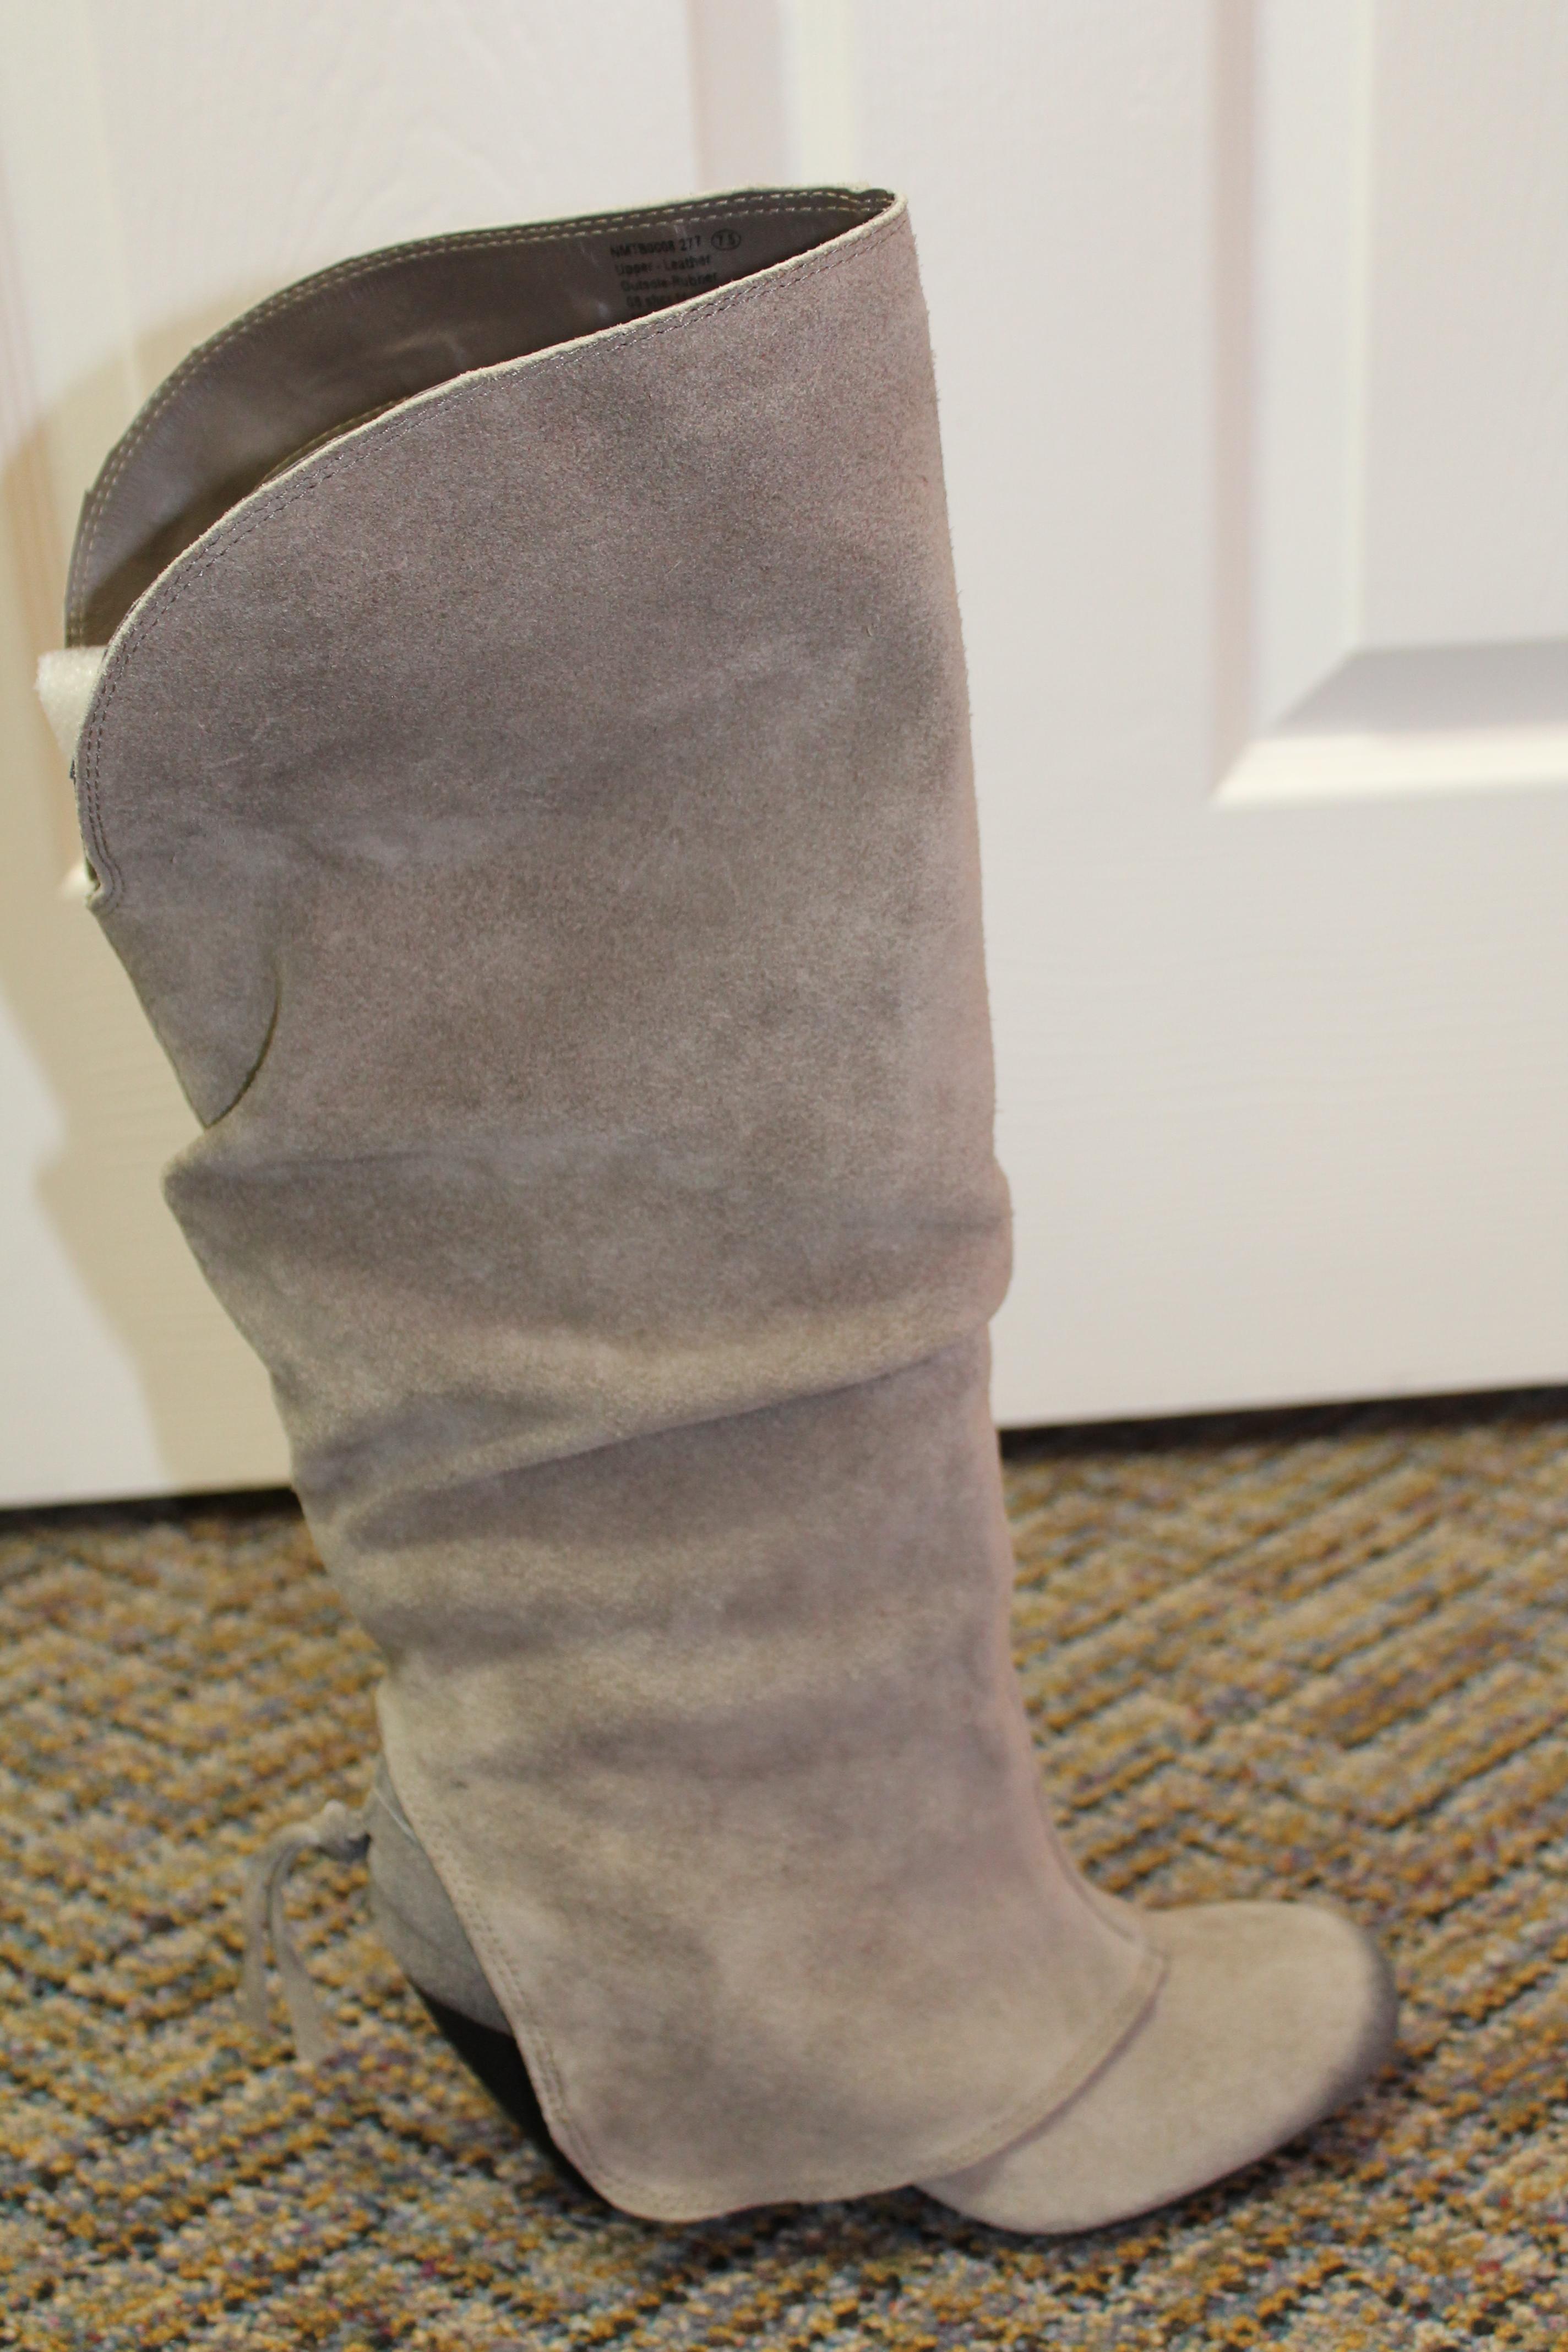 Naughty Monkey Femme Fatale Boot - Posh Boutique 458032417076